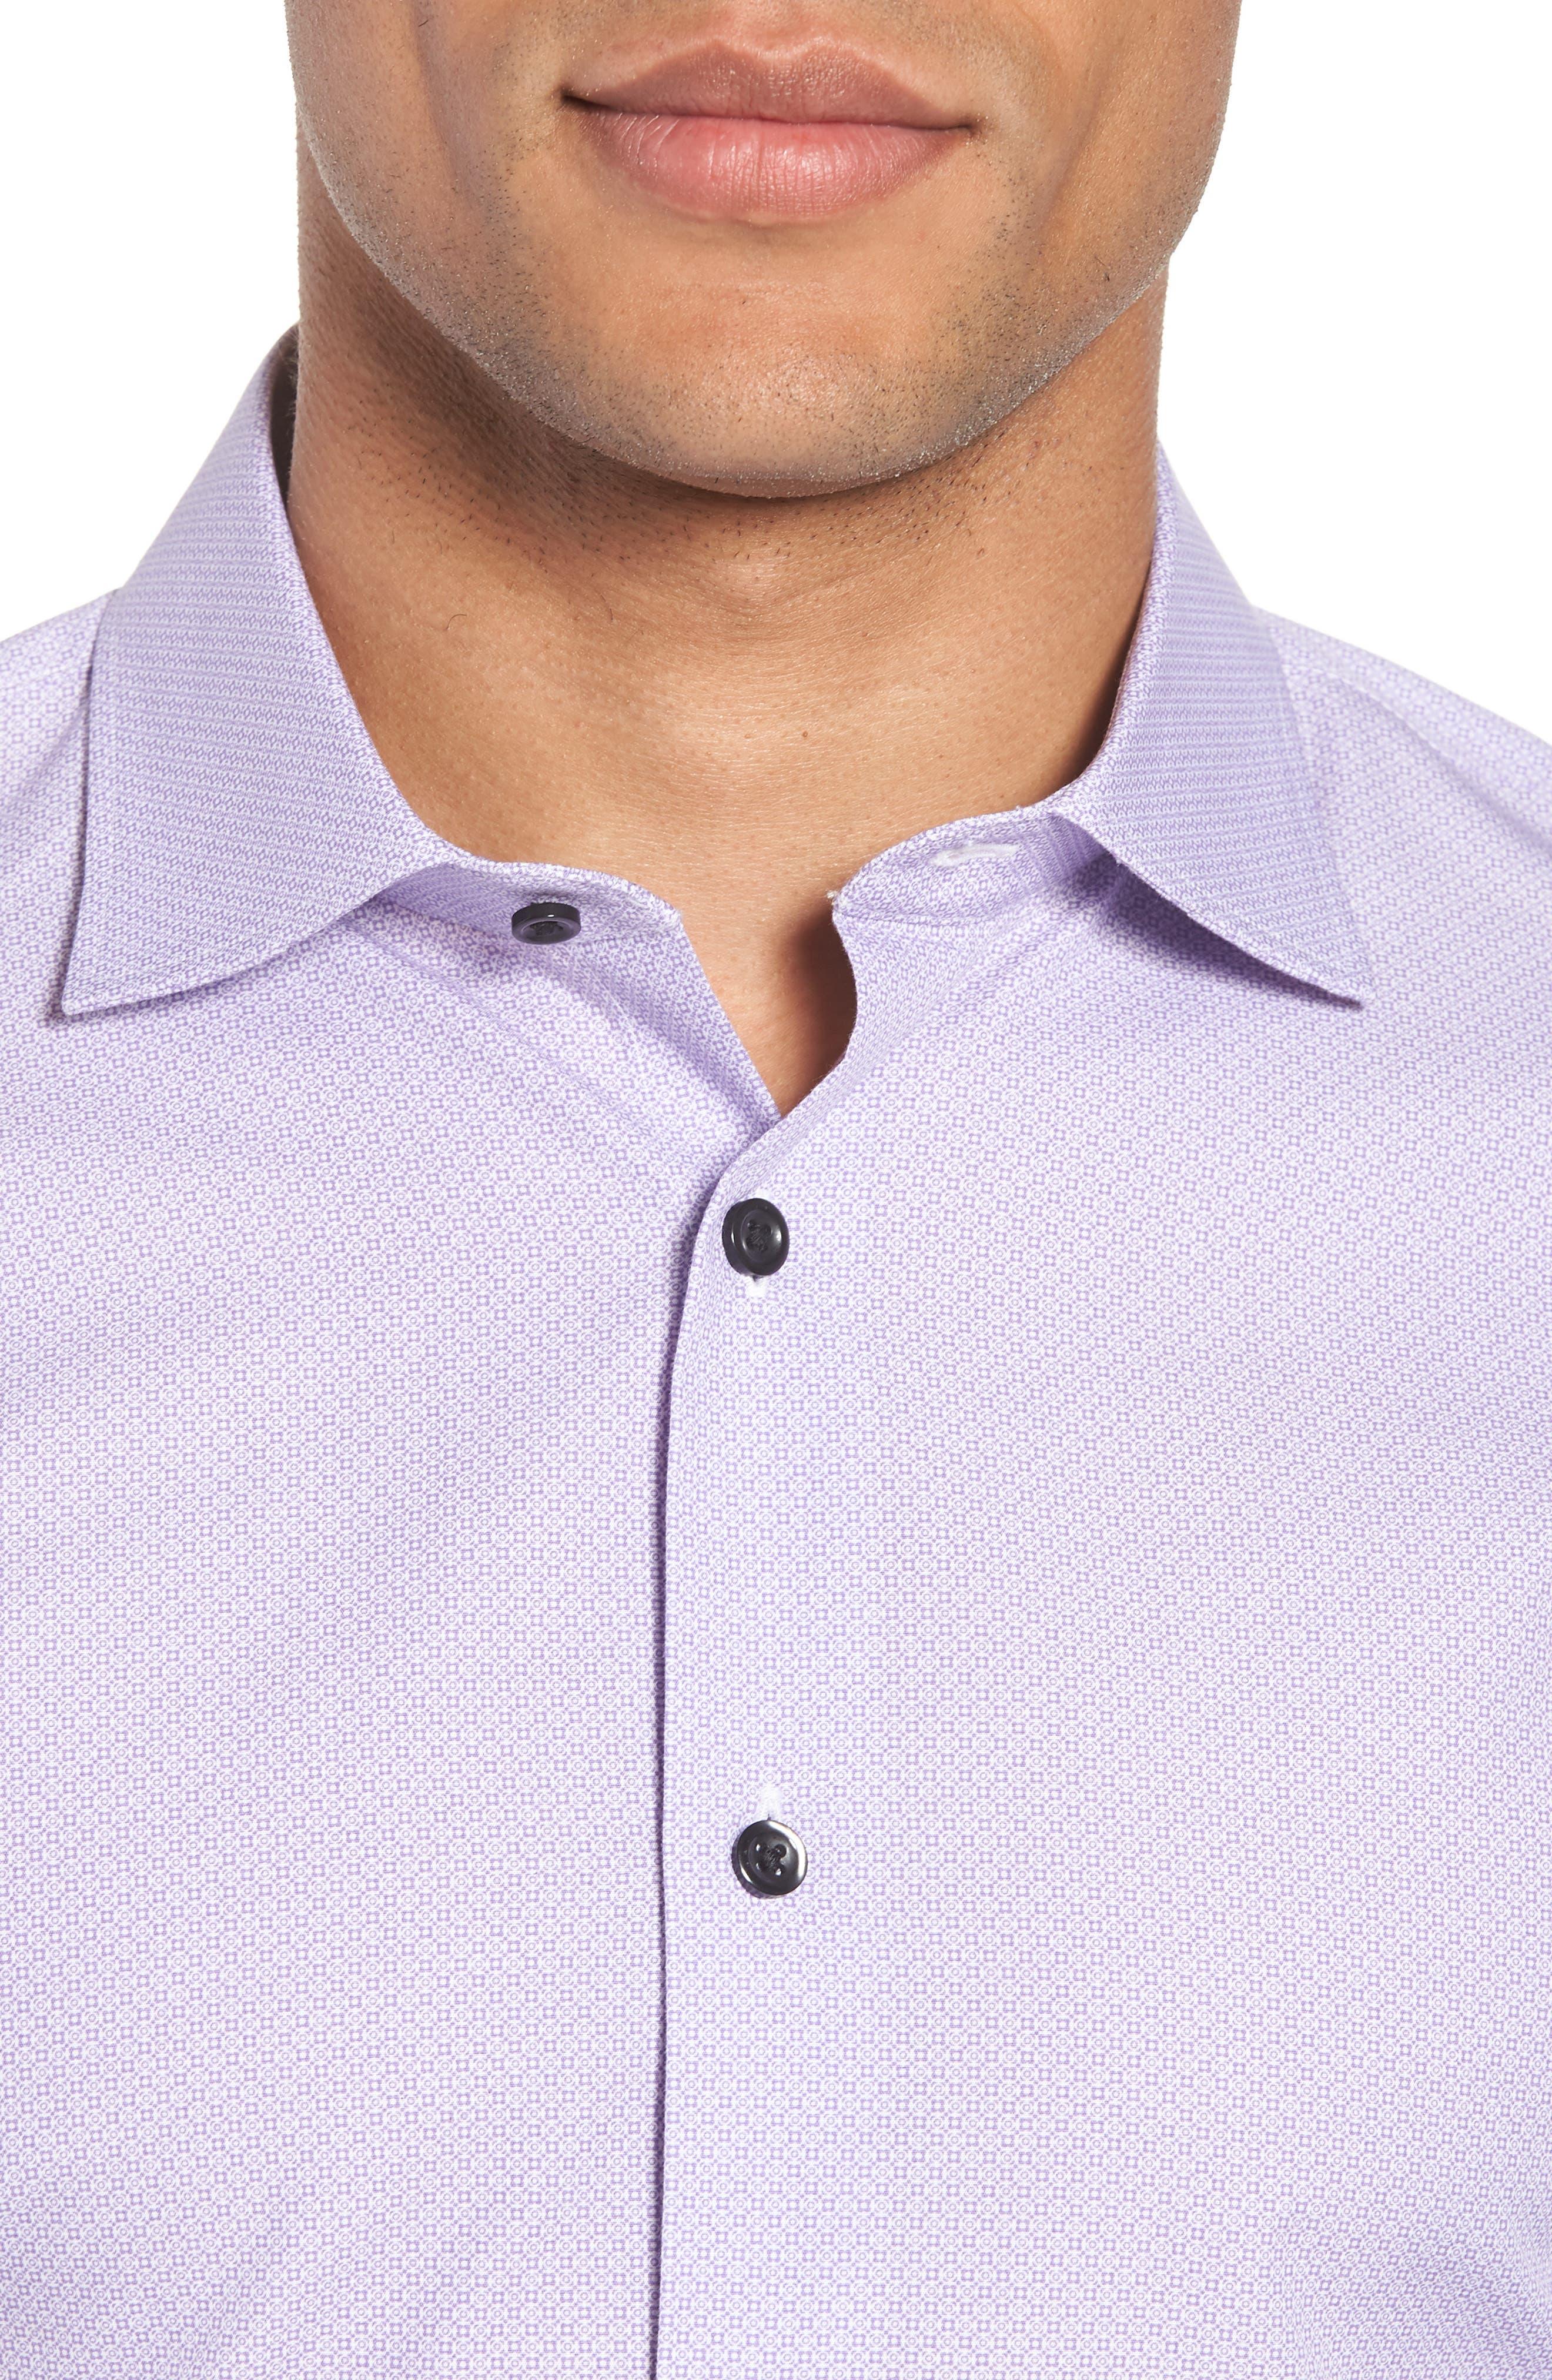 Trim Fit Geometric Dress Shirt,                             Alternate thumbnail 2, color,                             Purple Regal